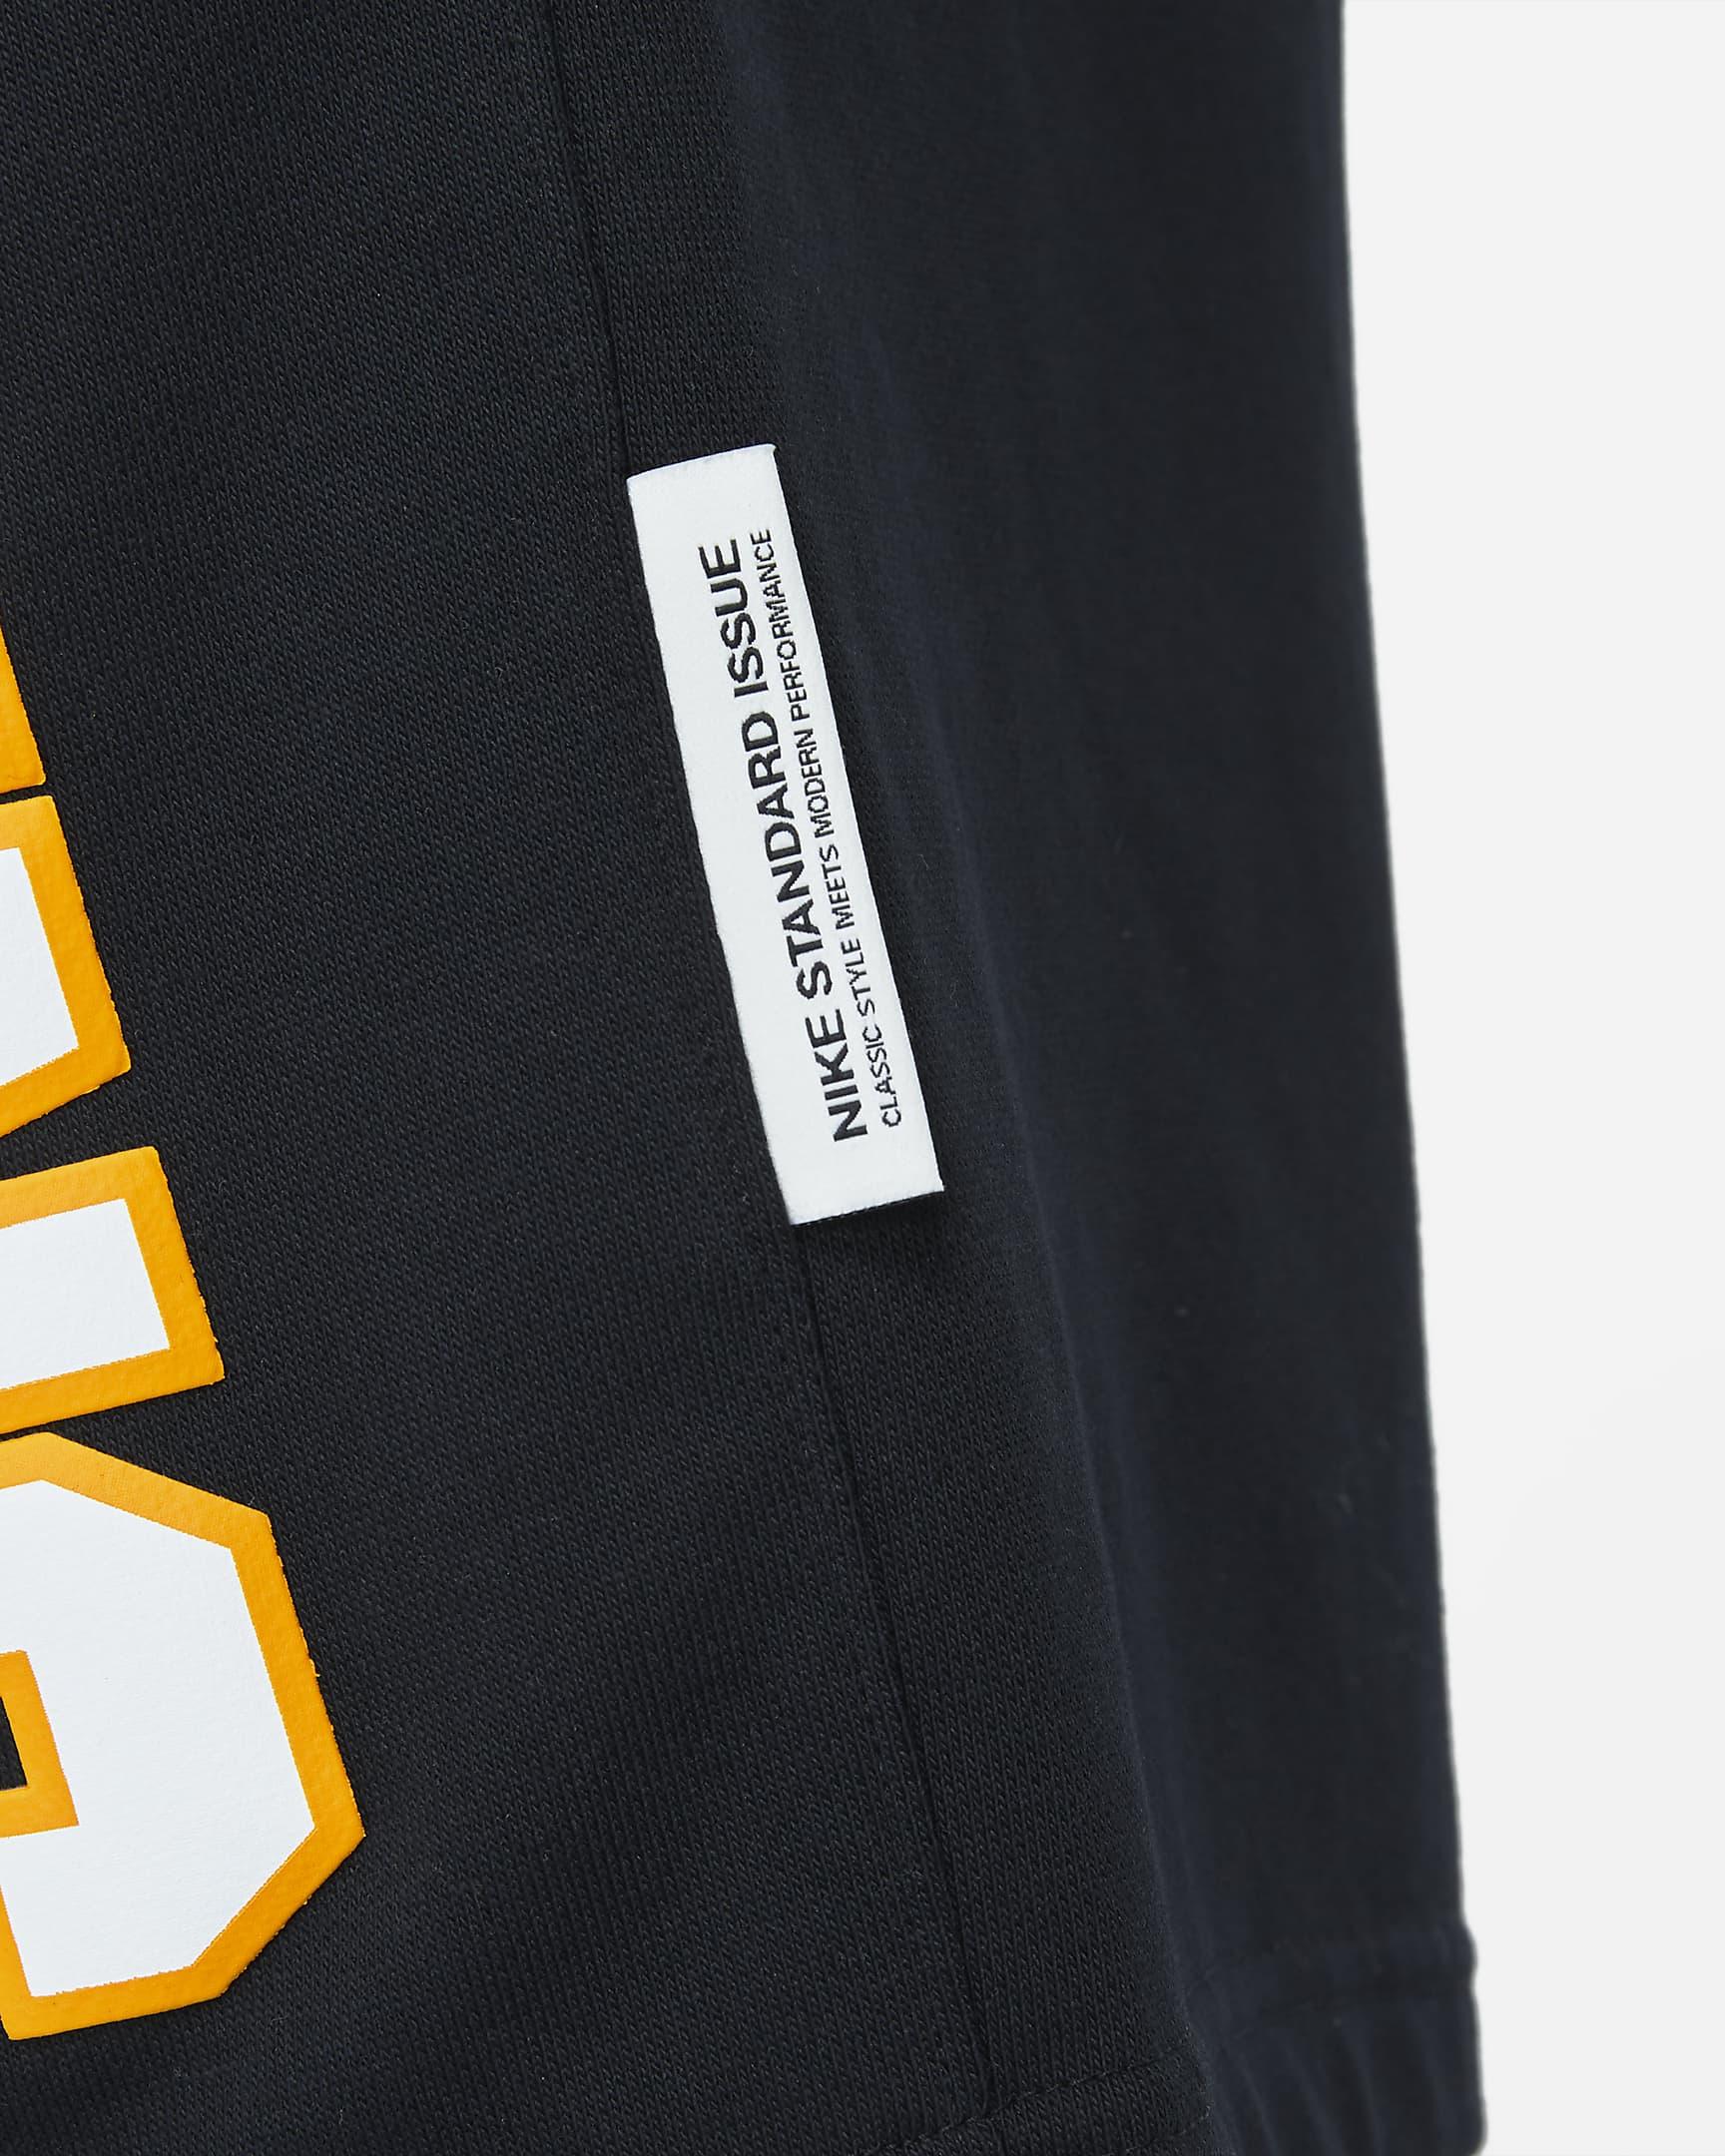 dri-fit-rayguns-mens-premium-basketball-shorts-V329rk-8